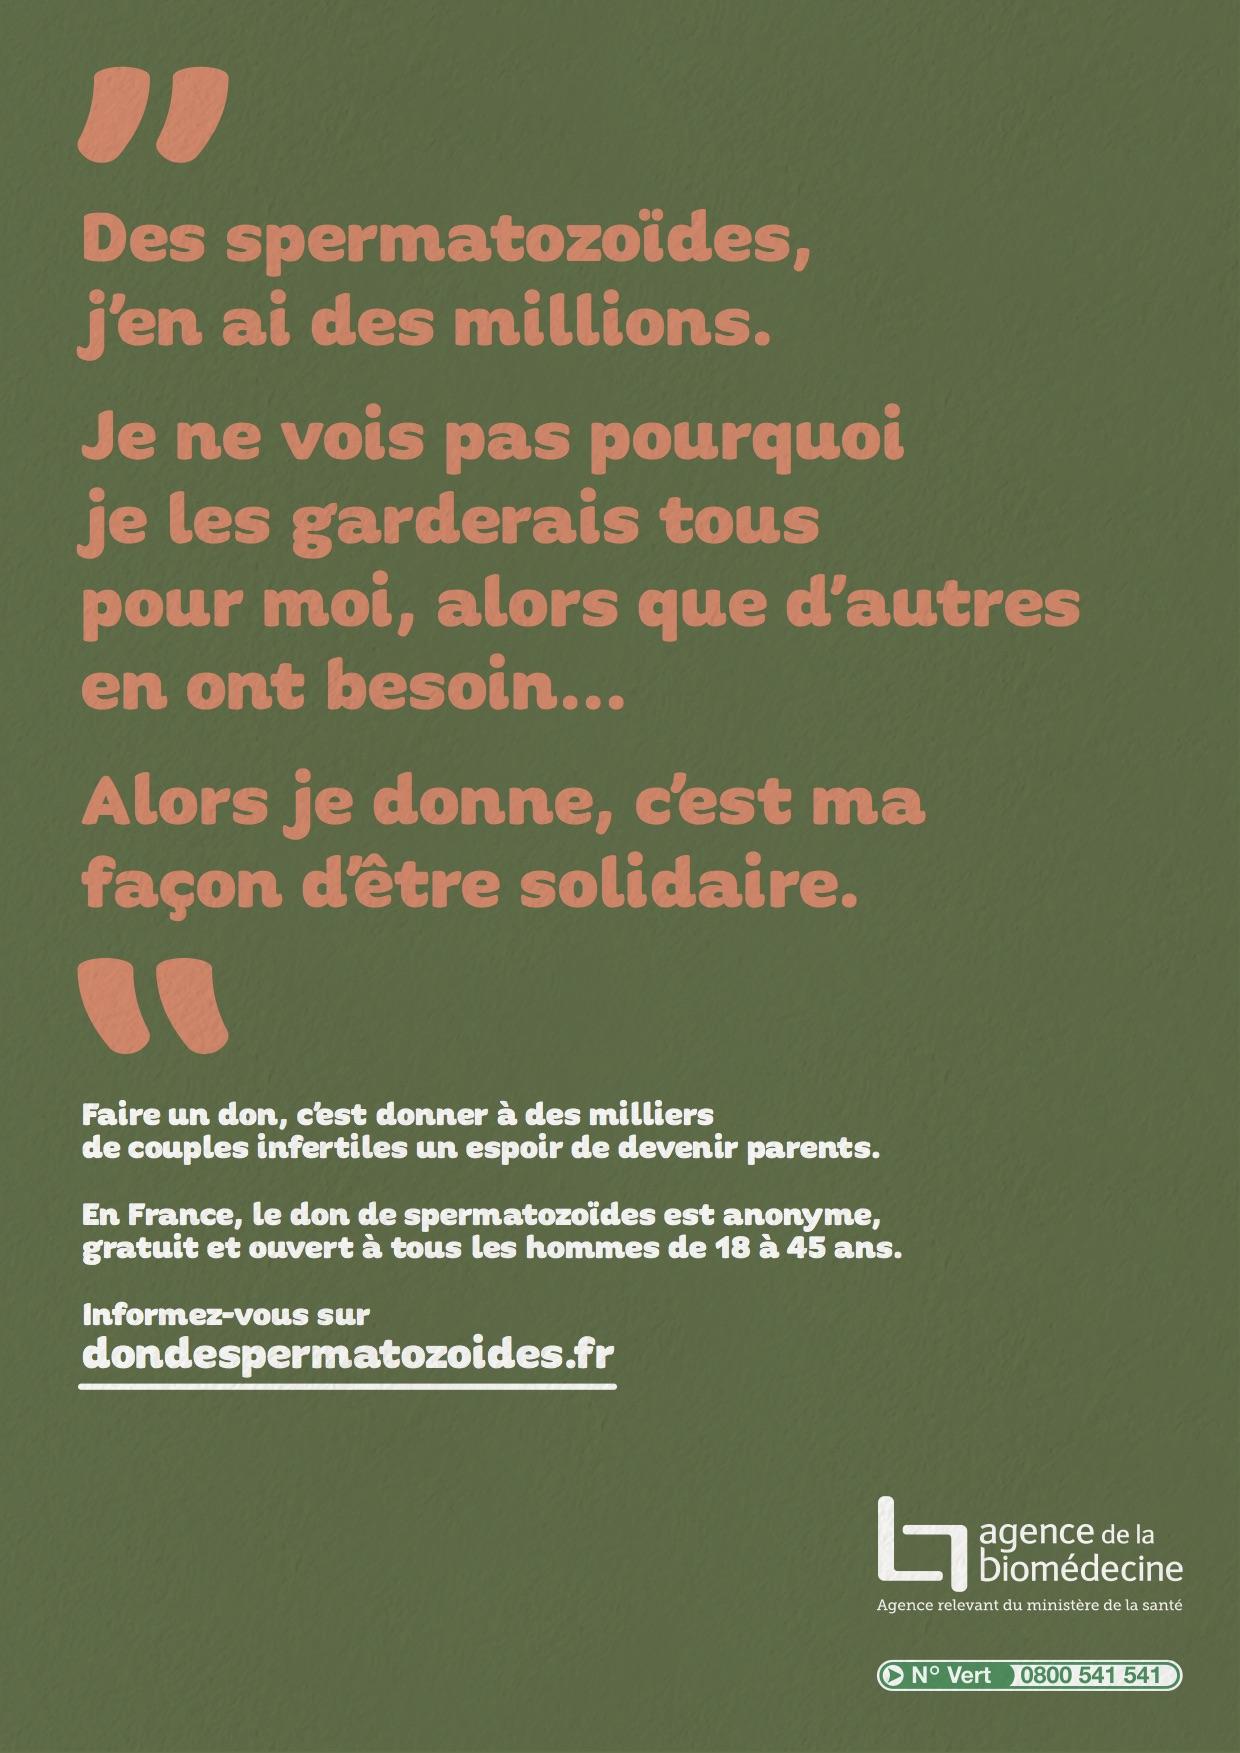 dons de spermatozoide prix france